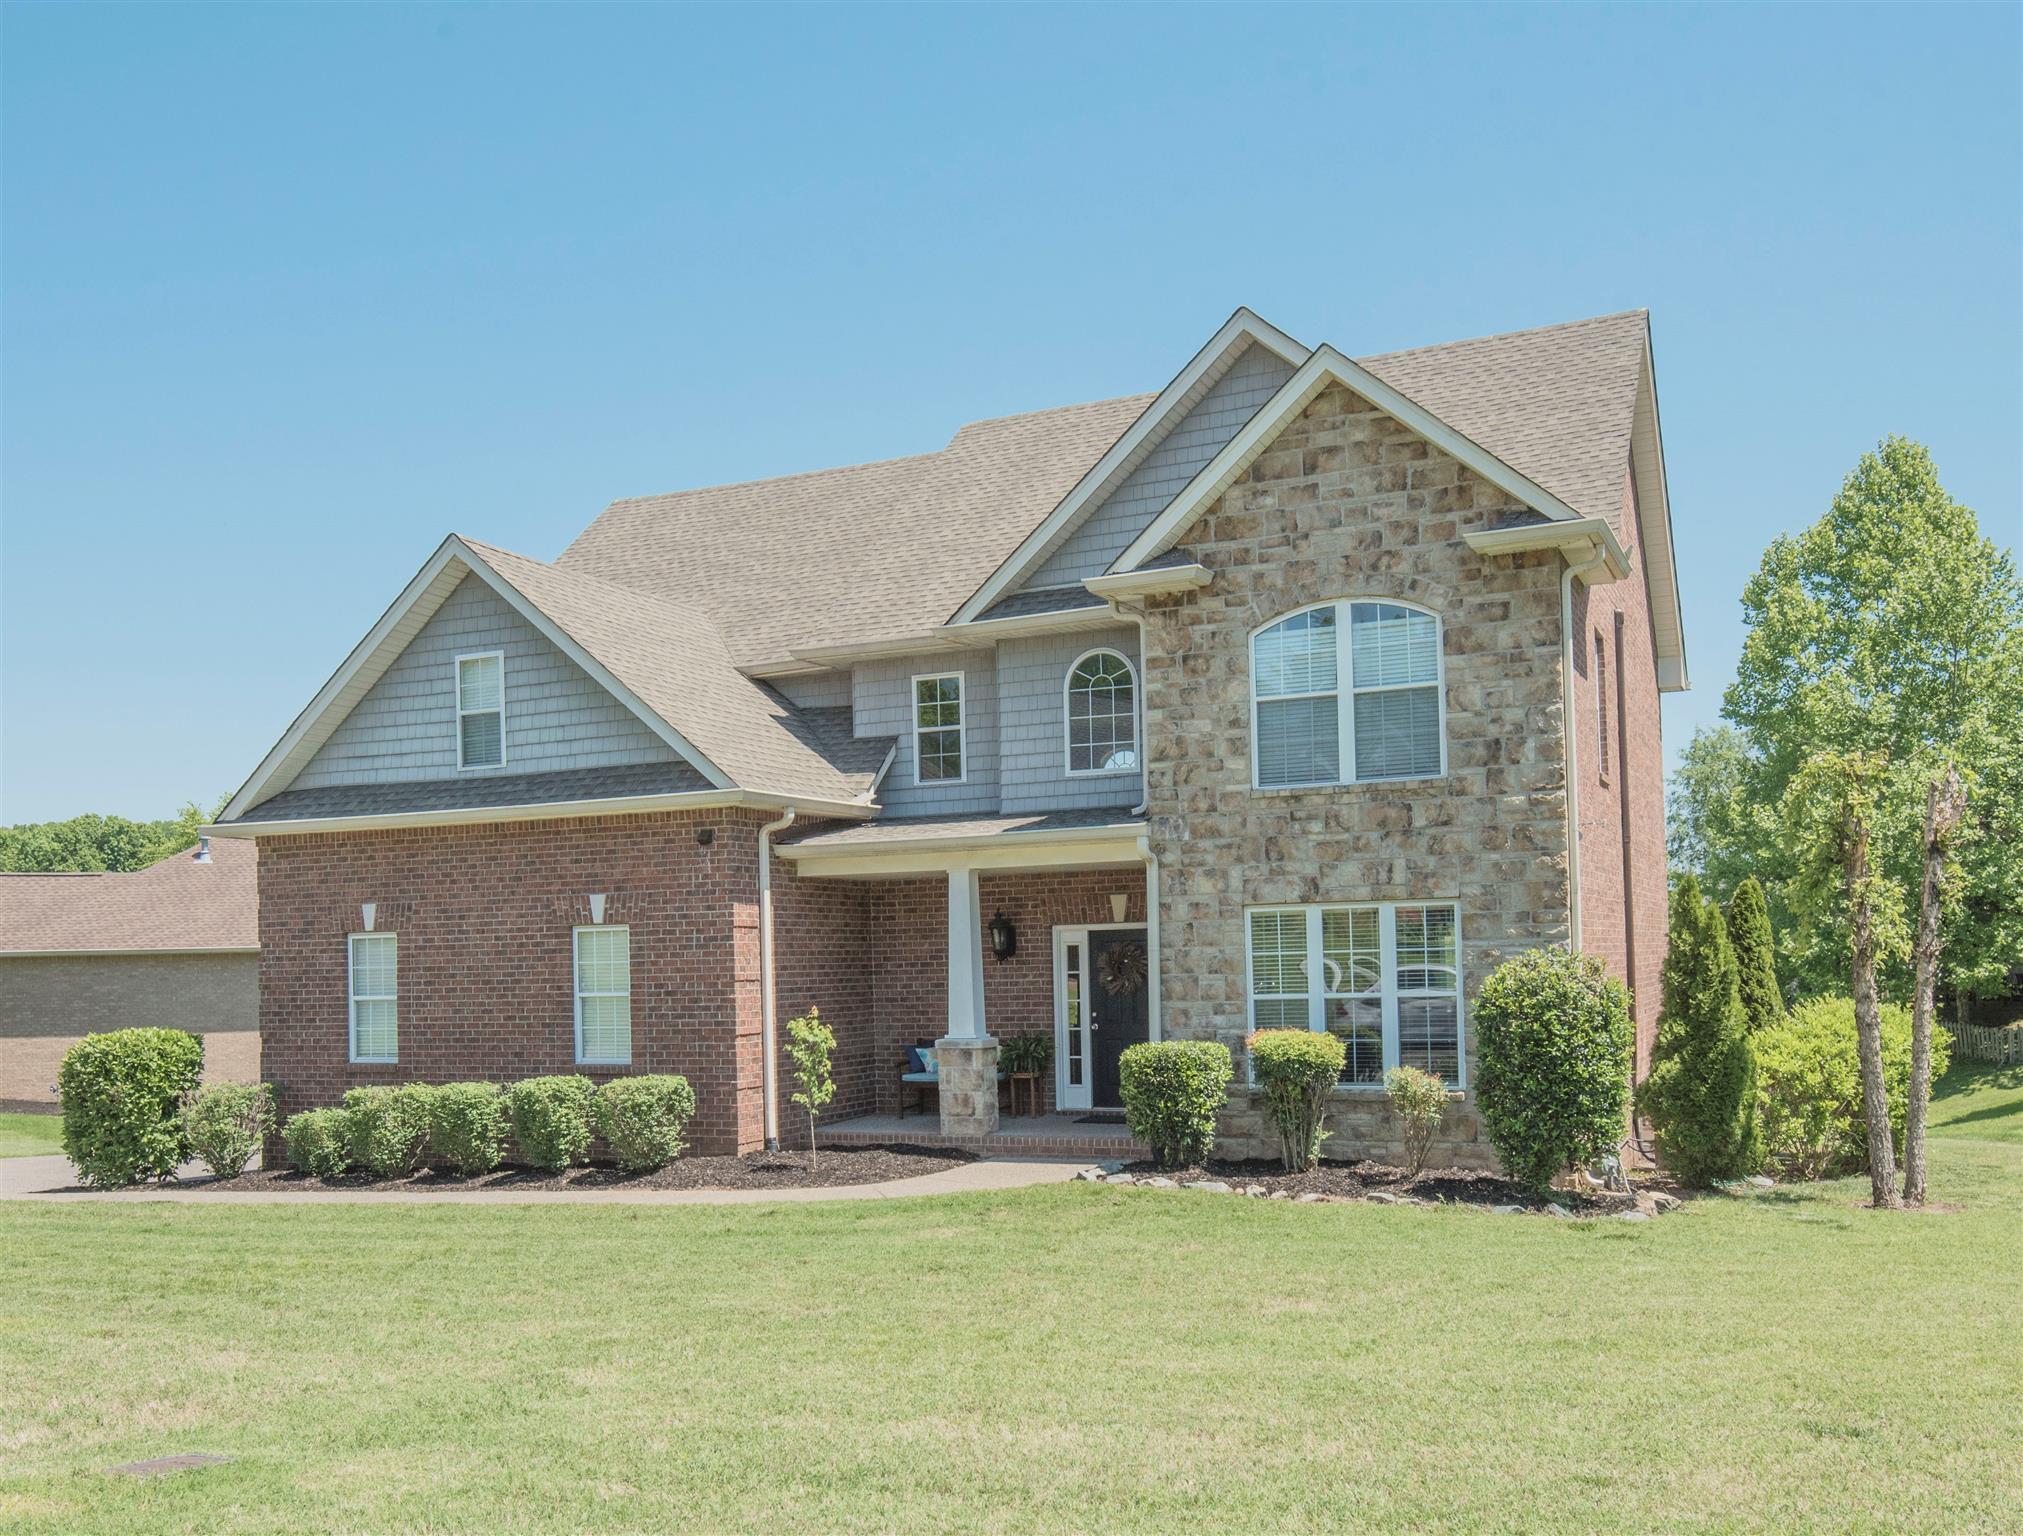 Photo of 111 Wynlands Dr  Goodlettsville  TN